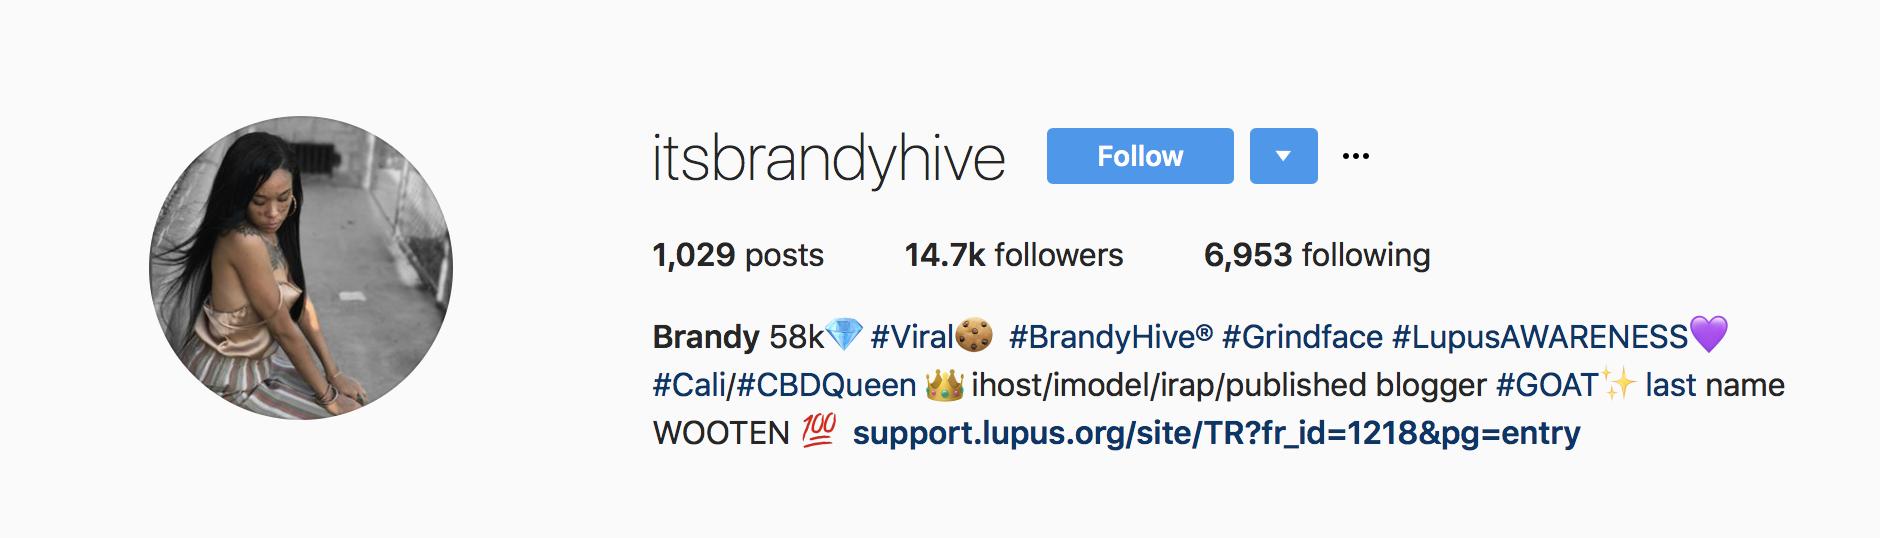 Brandy Hive Instagram